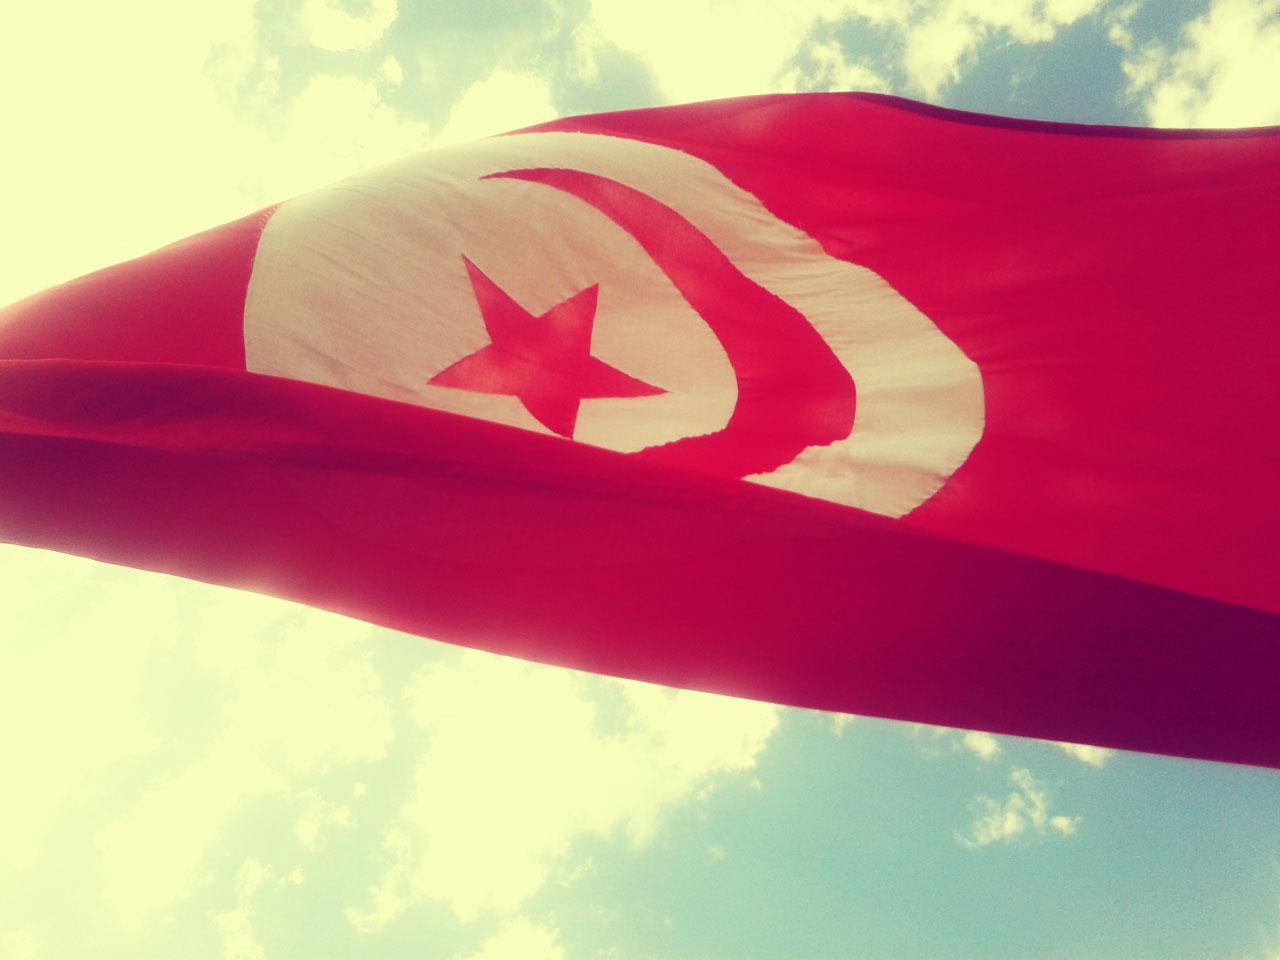 Solidarité avec Habib Kazdaghli